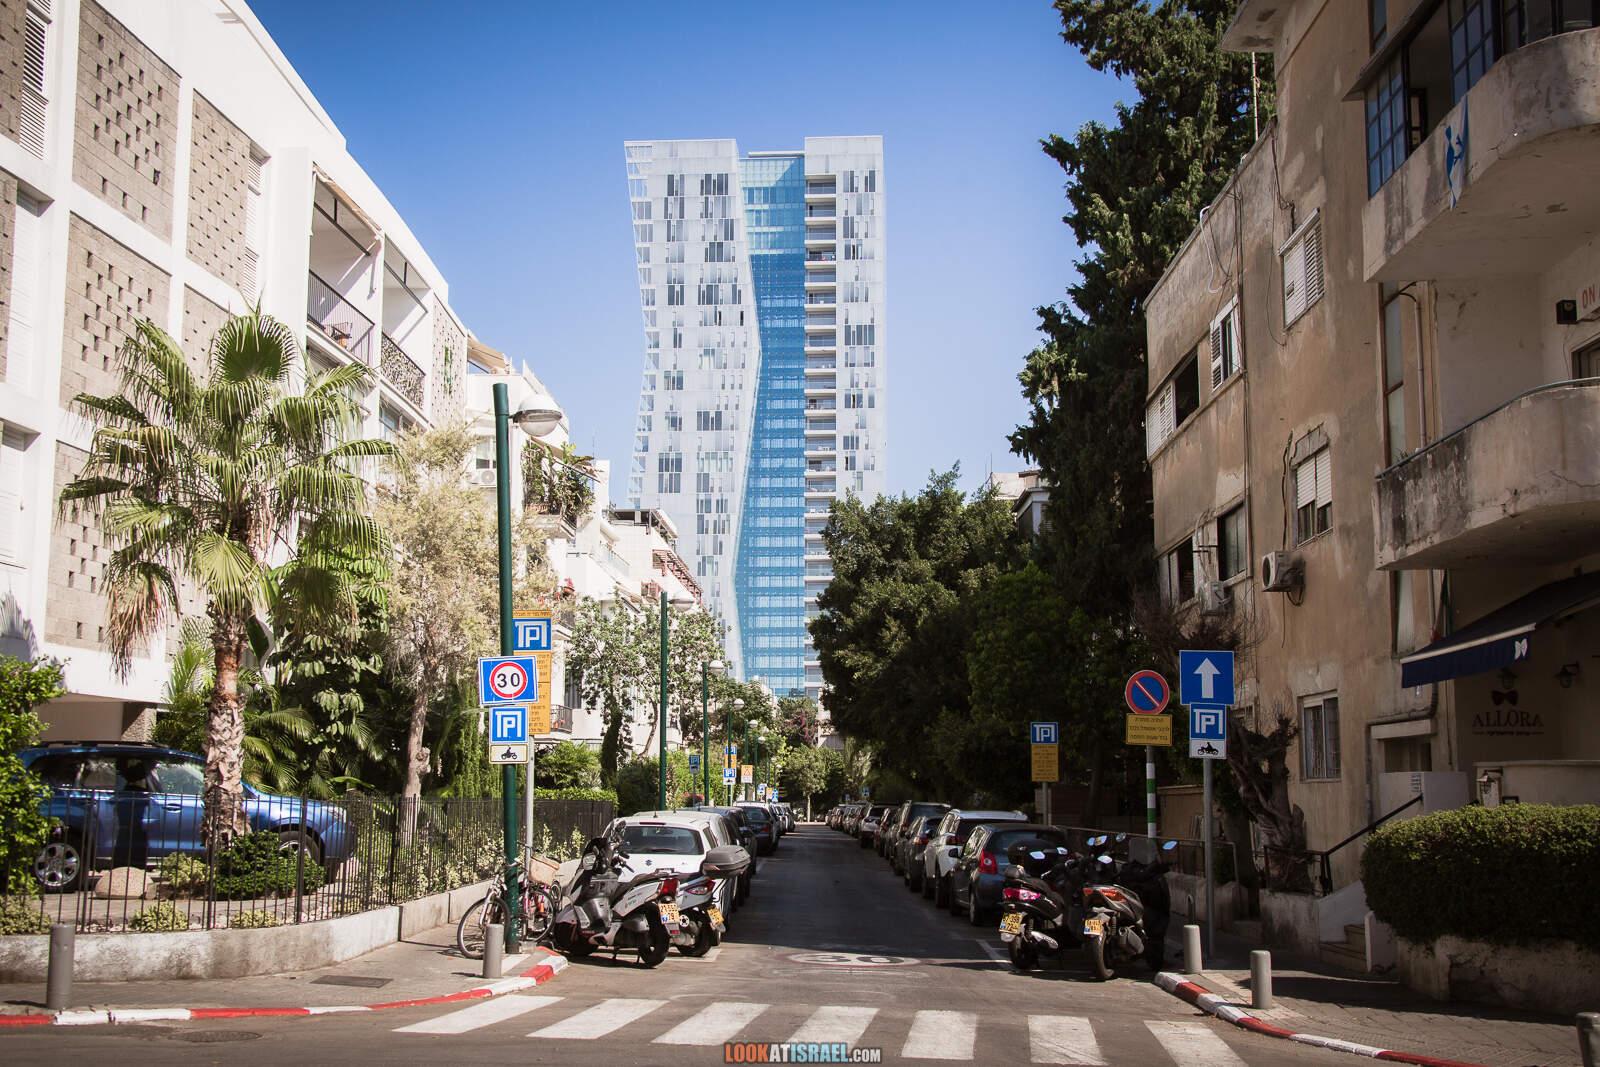 Тель-Авив, улица Дизенгофф во время карантина | Lockdown on beaches of Tel Aviv | LookAtIsrael.com - Фото путешествия по Израилю